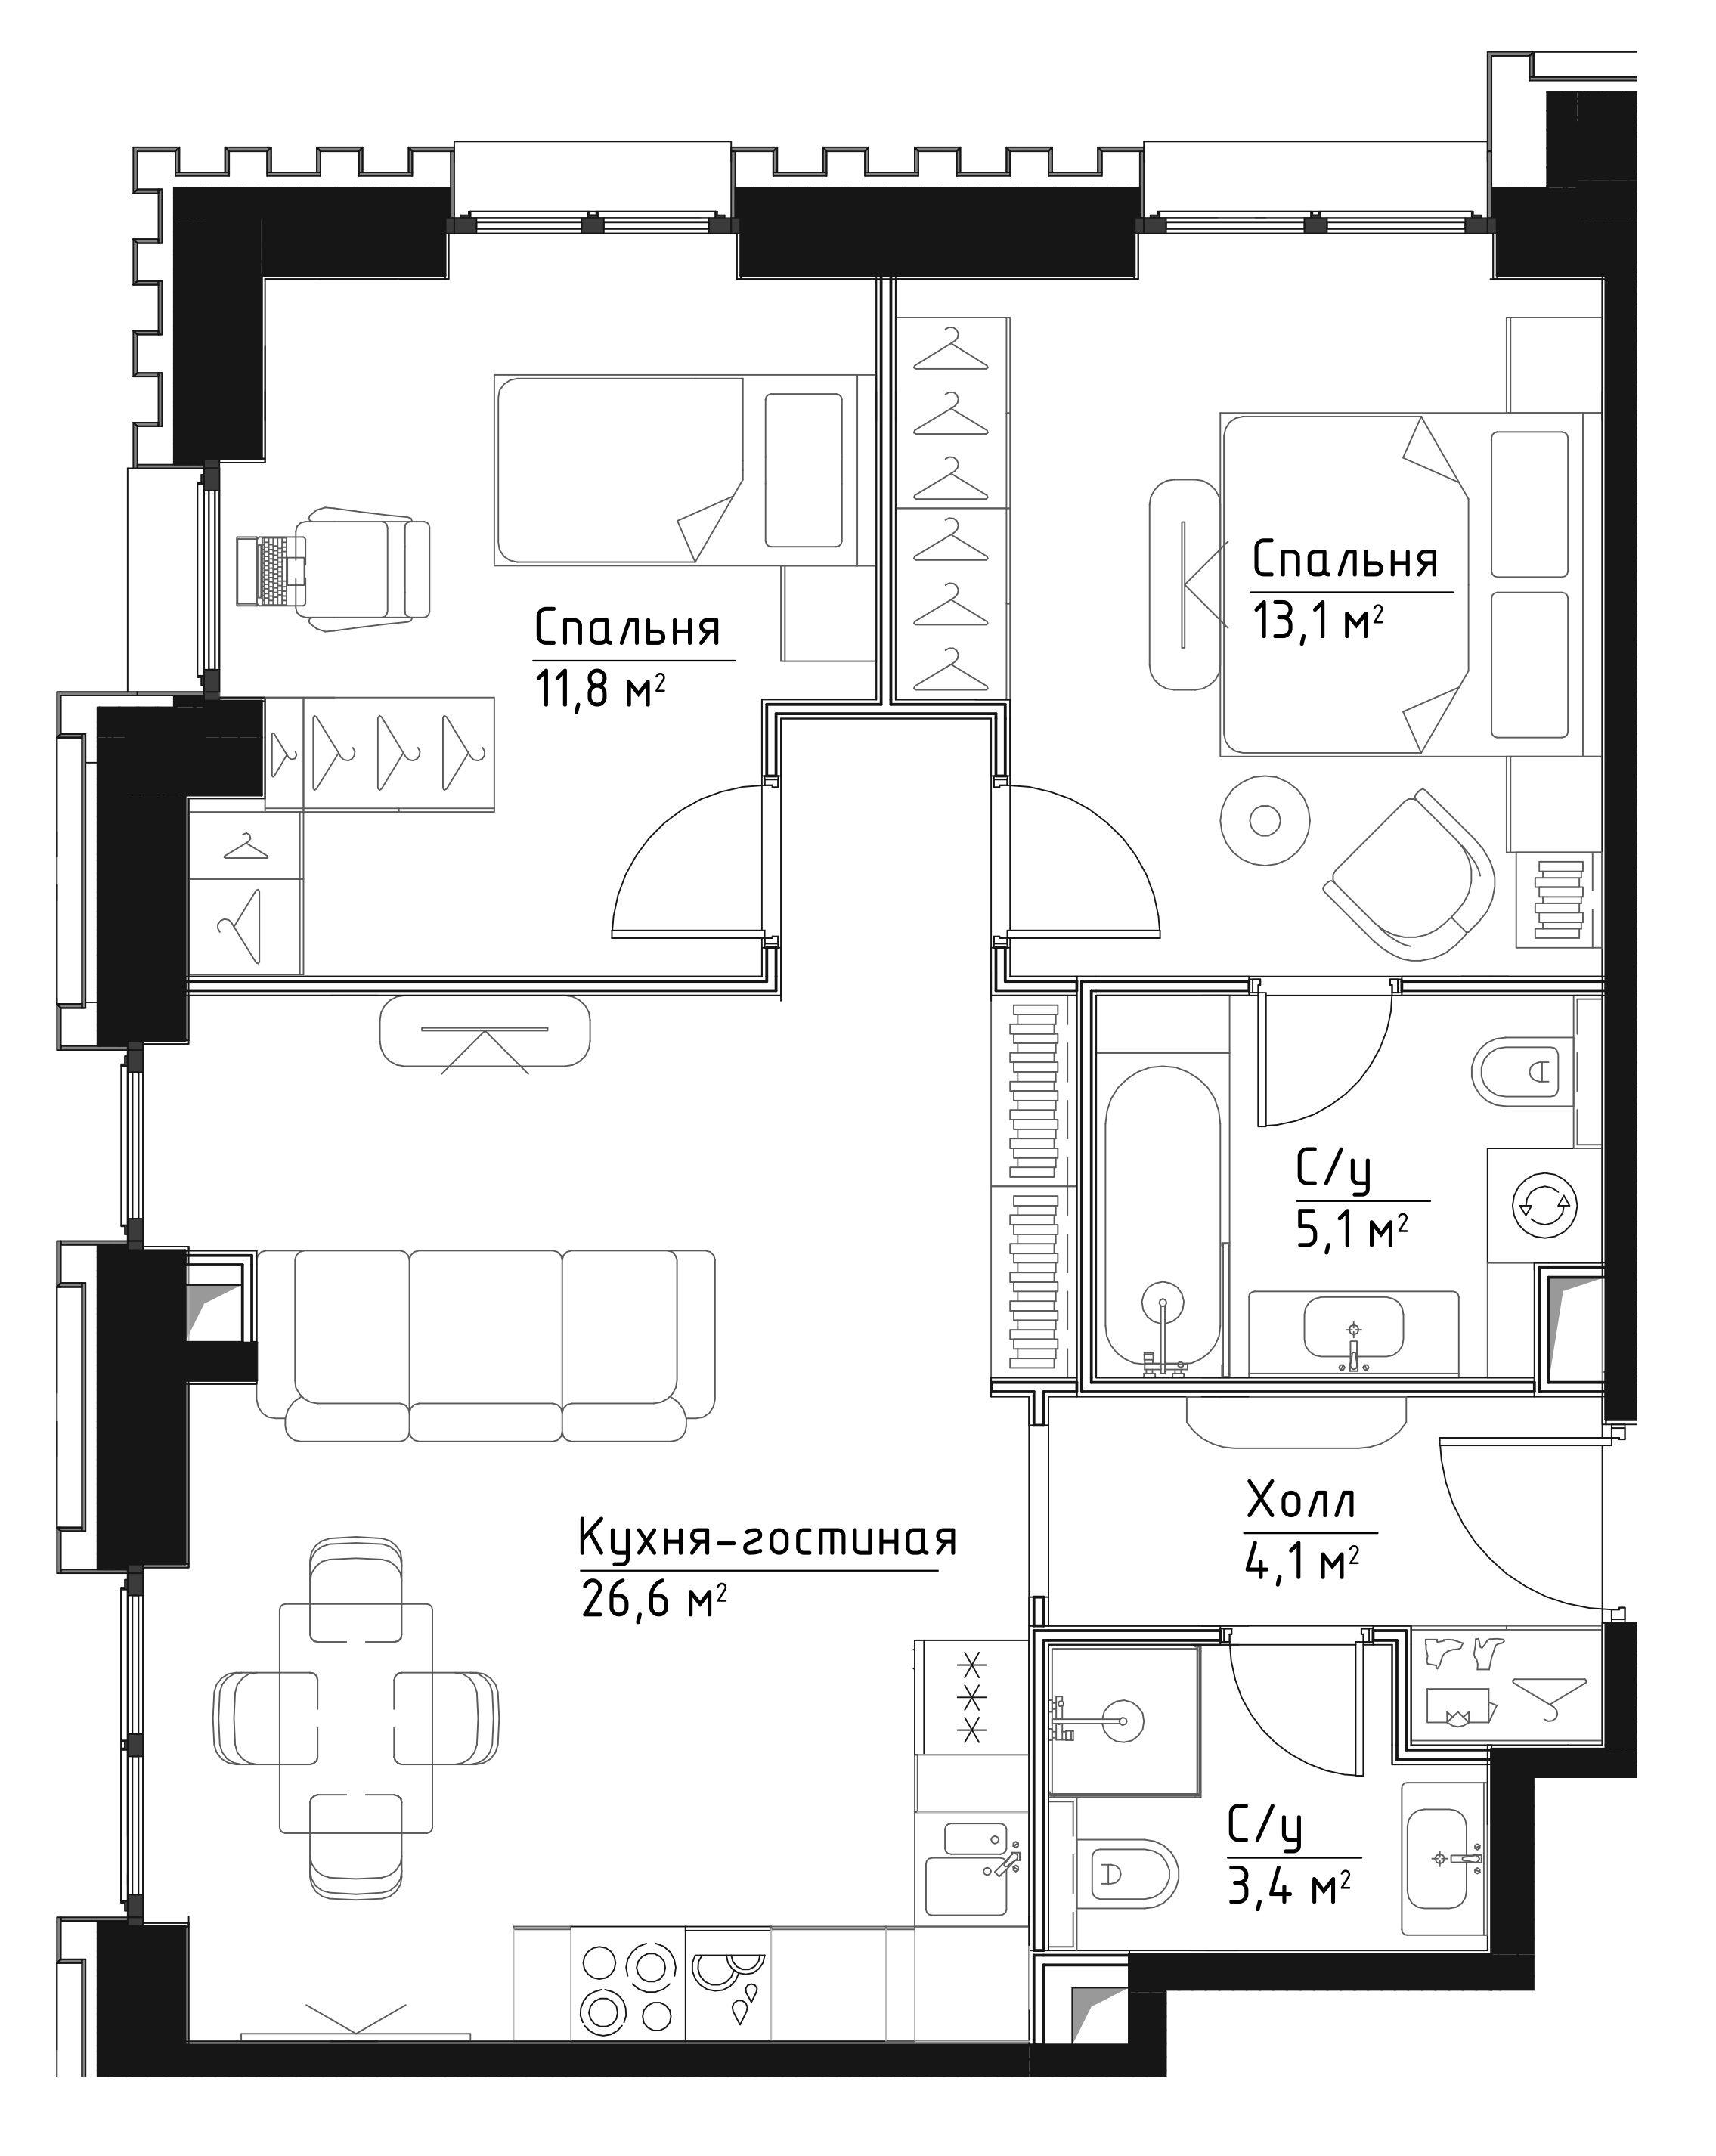 3Е-к.кв, 64.1 м²